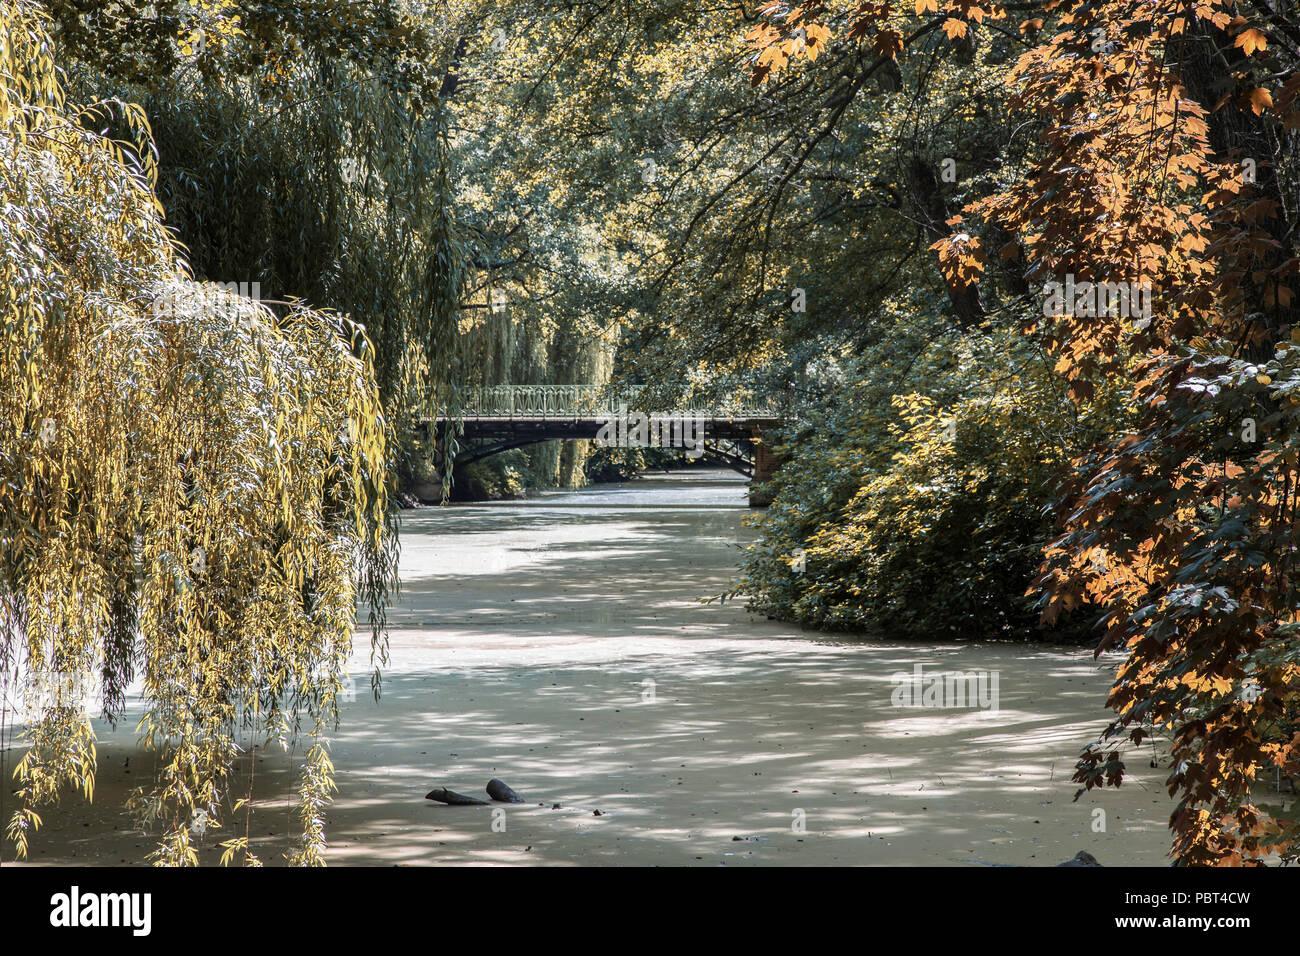 Bridge across a small river, Tiergarten, Berlin, Germany Stock Photo